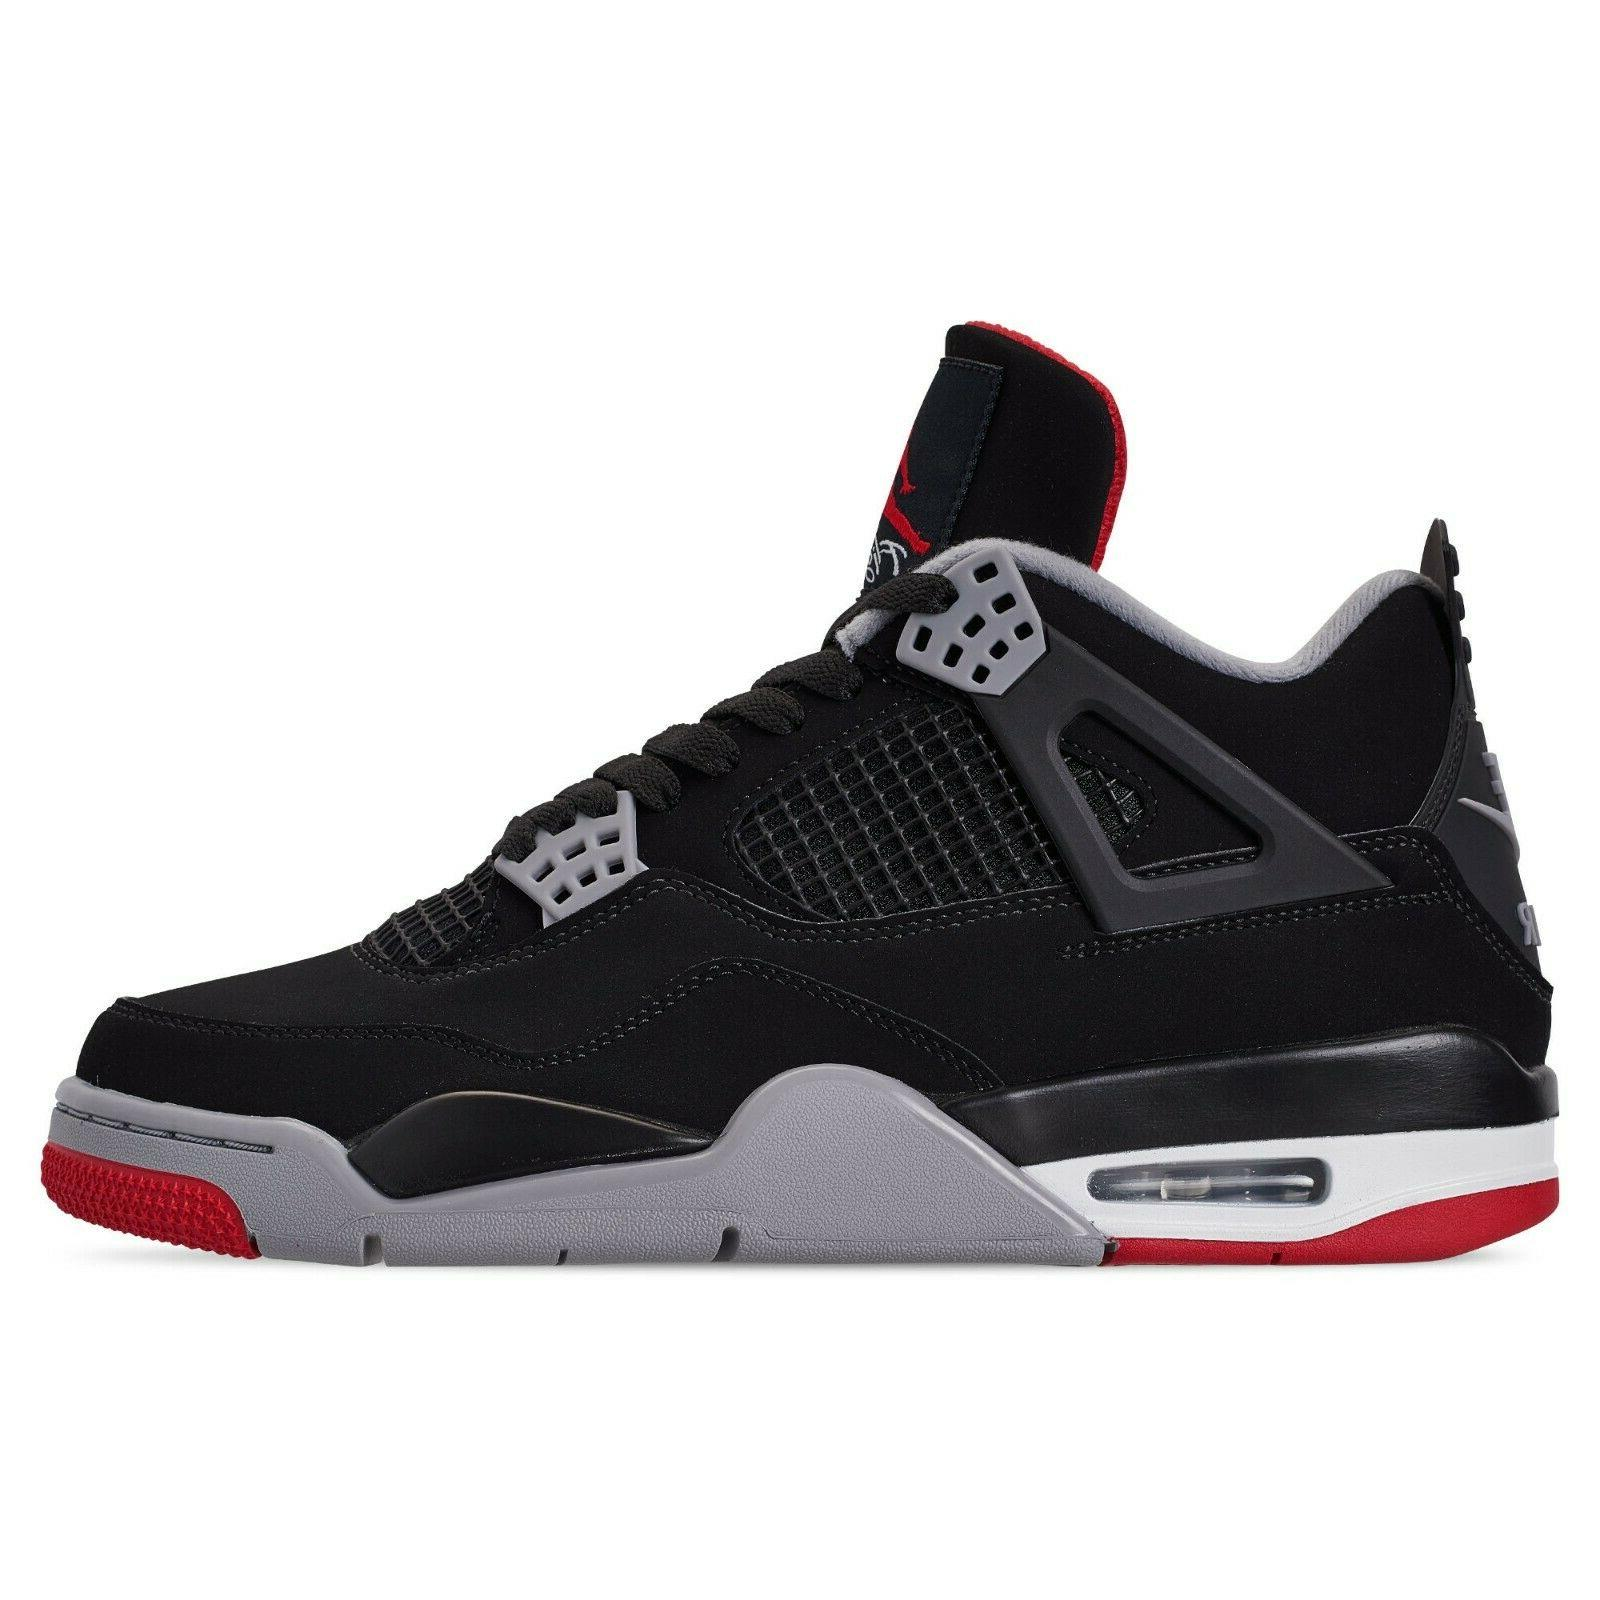 Air Jordan Retro OG Cement Red 308497